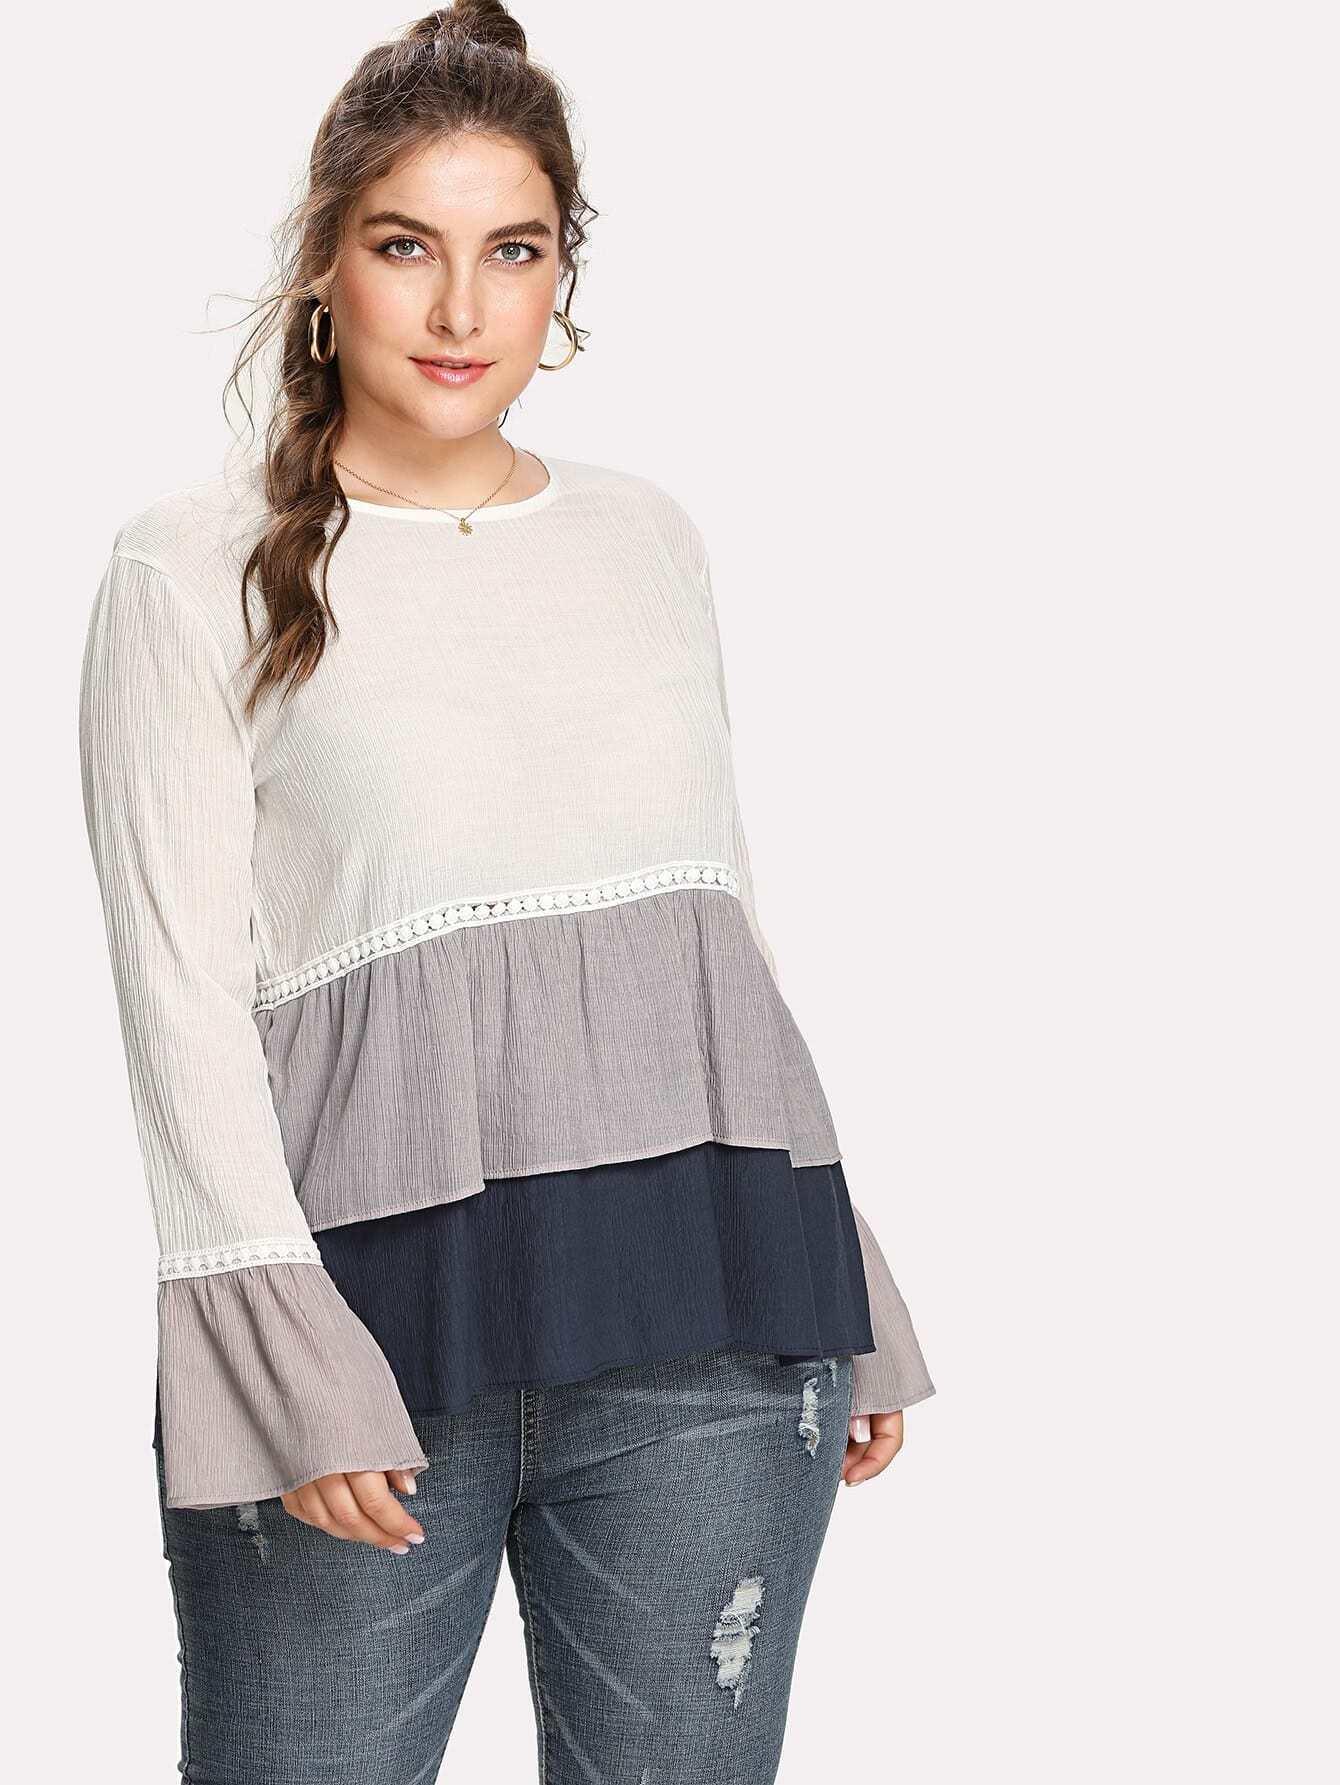 Contrast Lace Layered Ruffle Hem Top